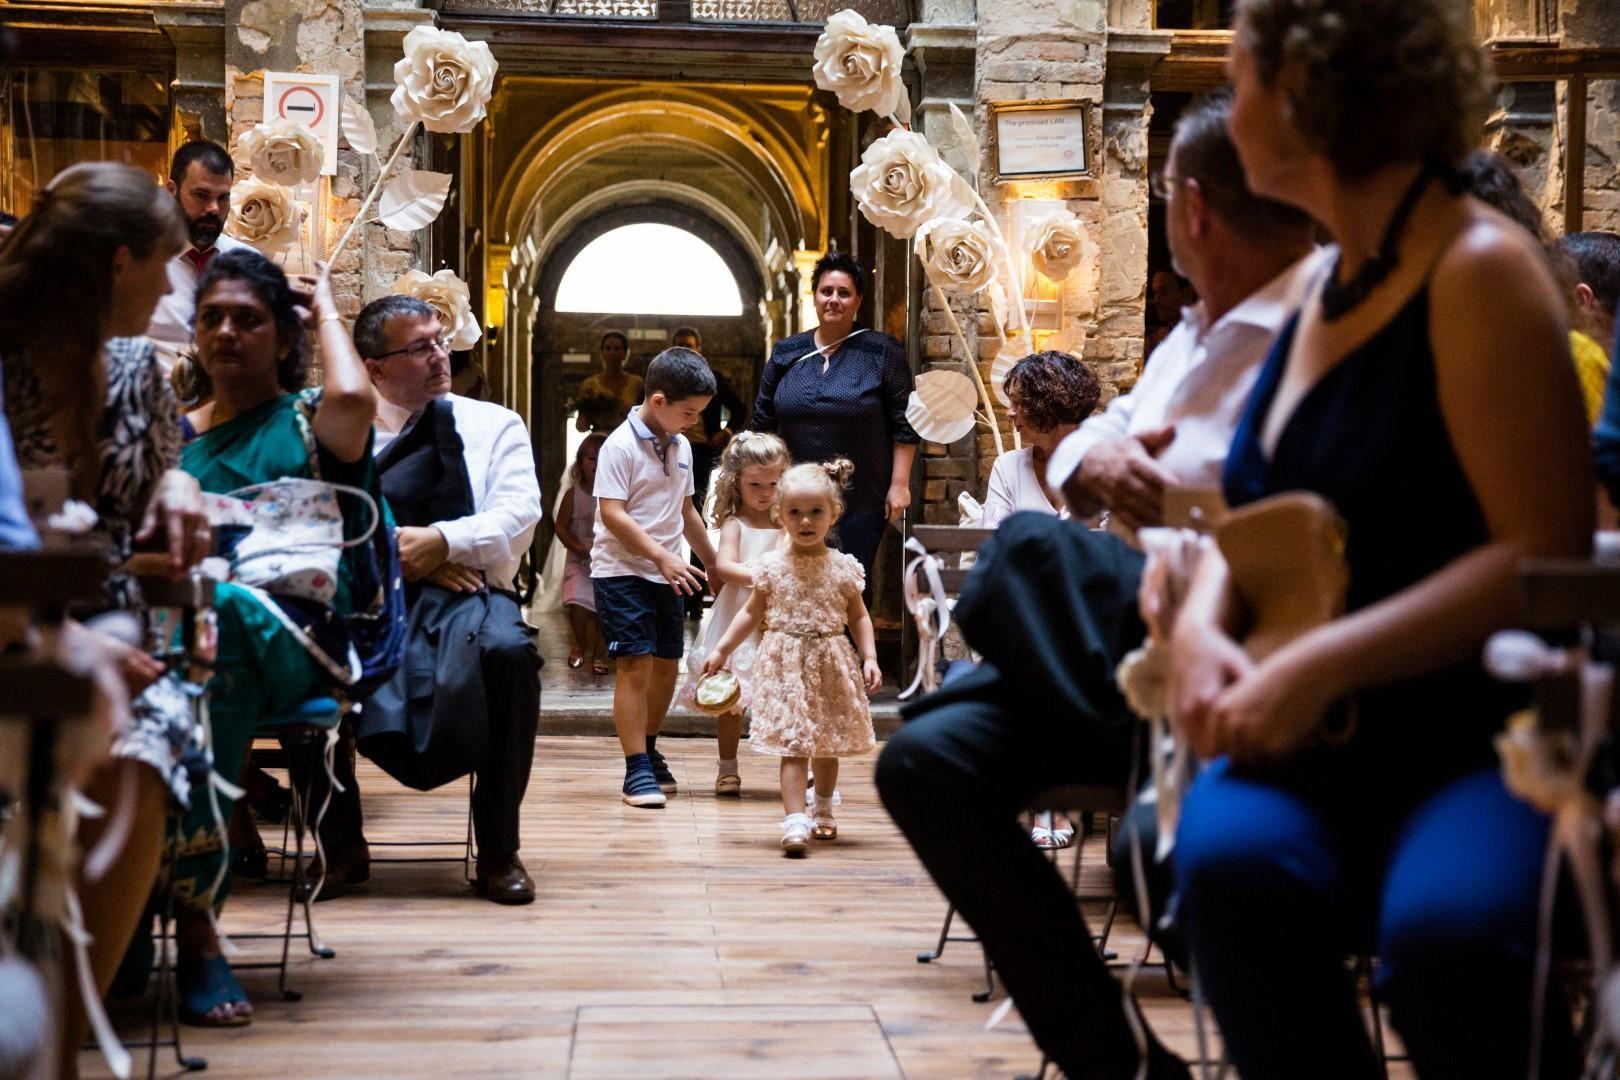 ,daalarna esküvő,esküvő,valódia esküvő,esküvő daalarna ruhában,flow art dekor,daalarna ruha,brody studios,wild flower bar,török bognár reni,